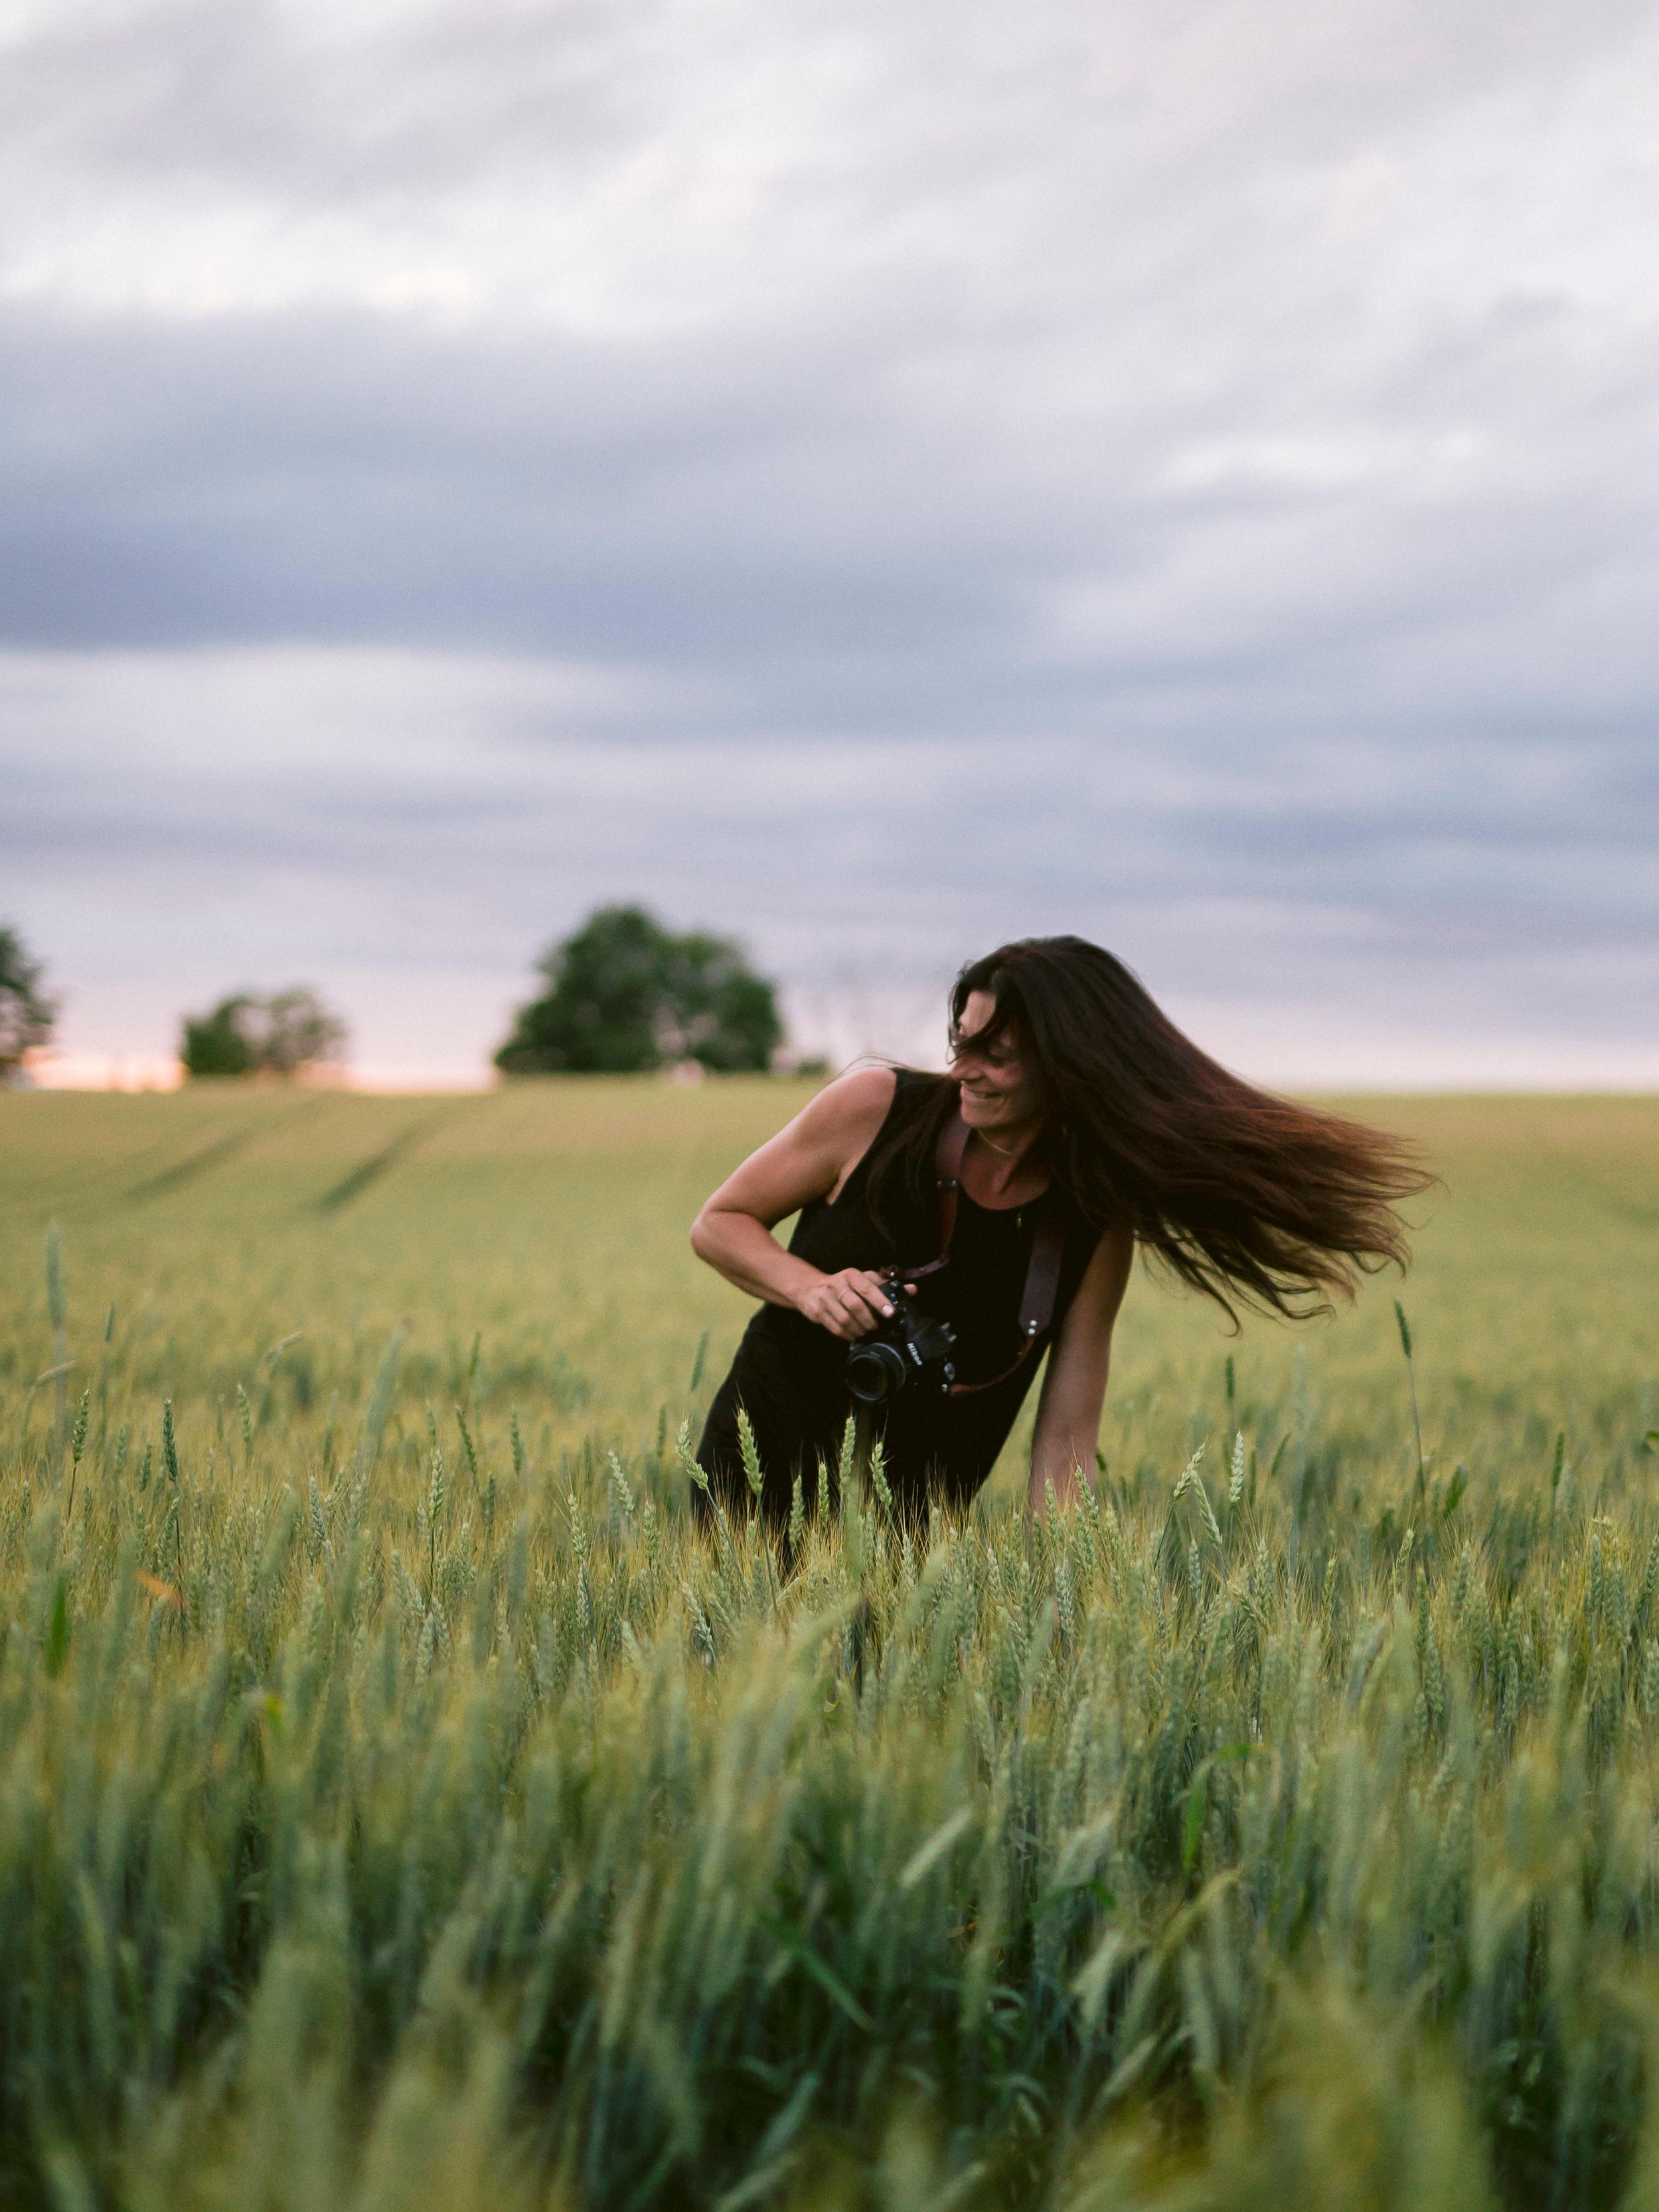 Photography by Alyssa Joline.